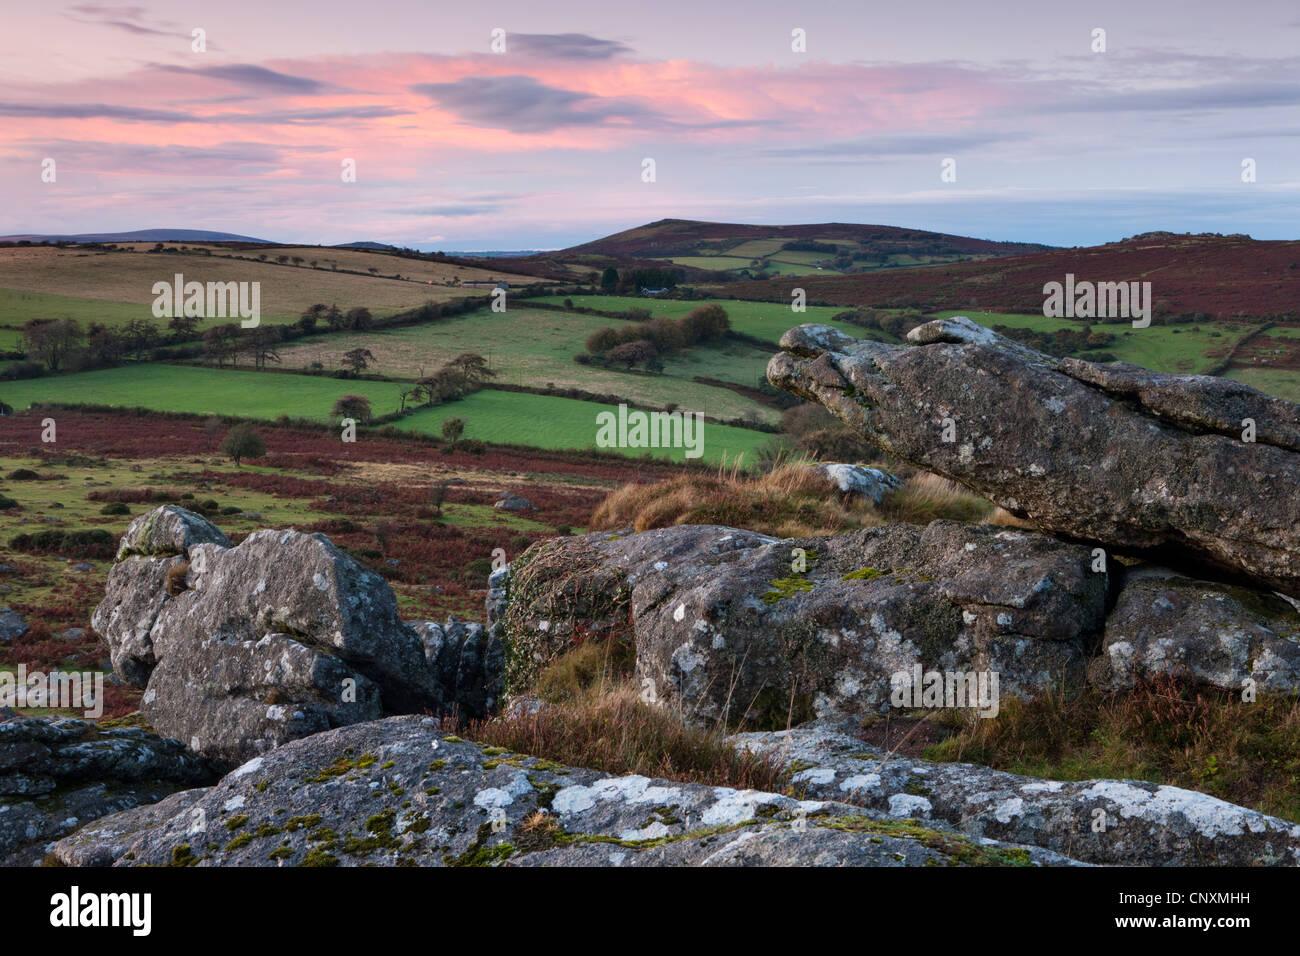 Twilight su Dartmoor campagna vista dal hound Tor, Dartmoor Devon, Inghilterra. In autunno (ottobre 2011). Foto Stock